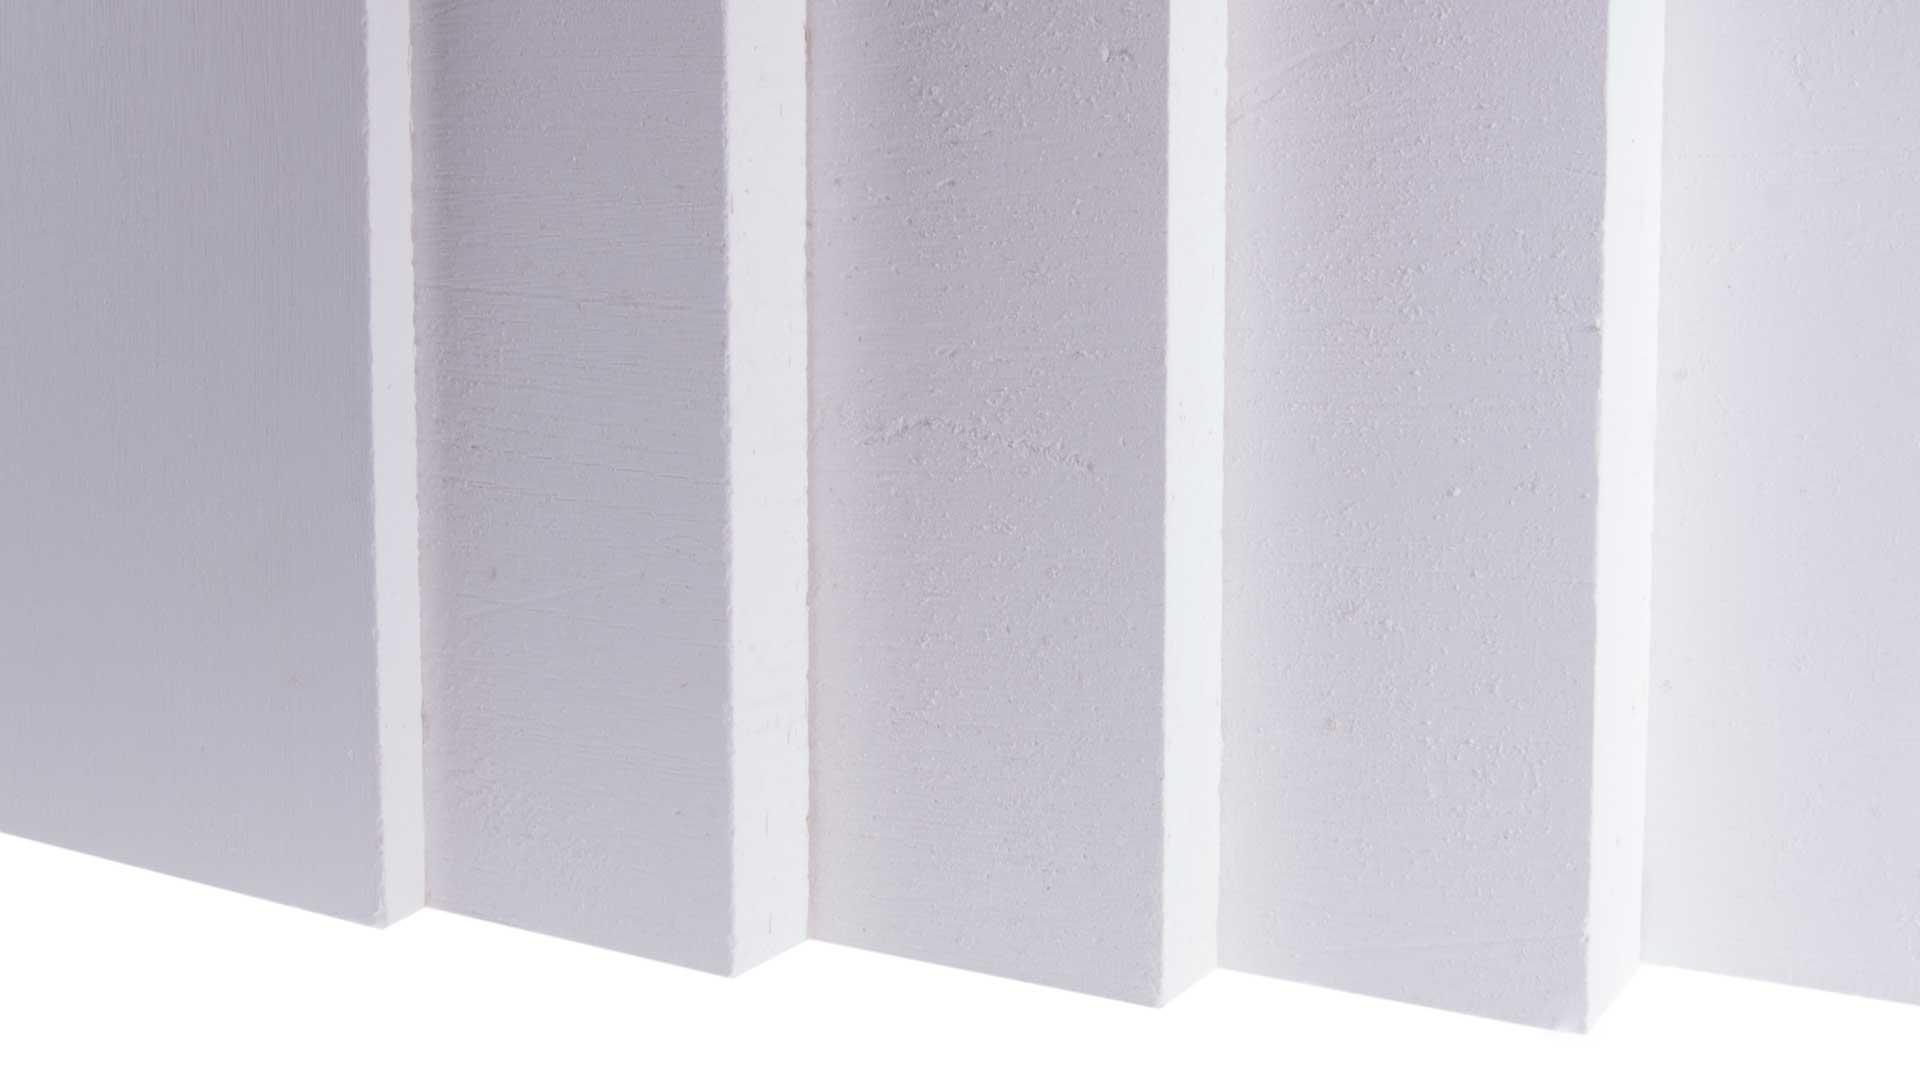 Favorit Klimaplatte 5 mm (Platte: 0,72 m²) - klimaplatte.shop ZR63